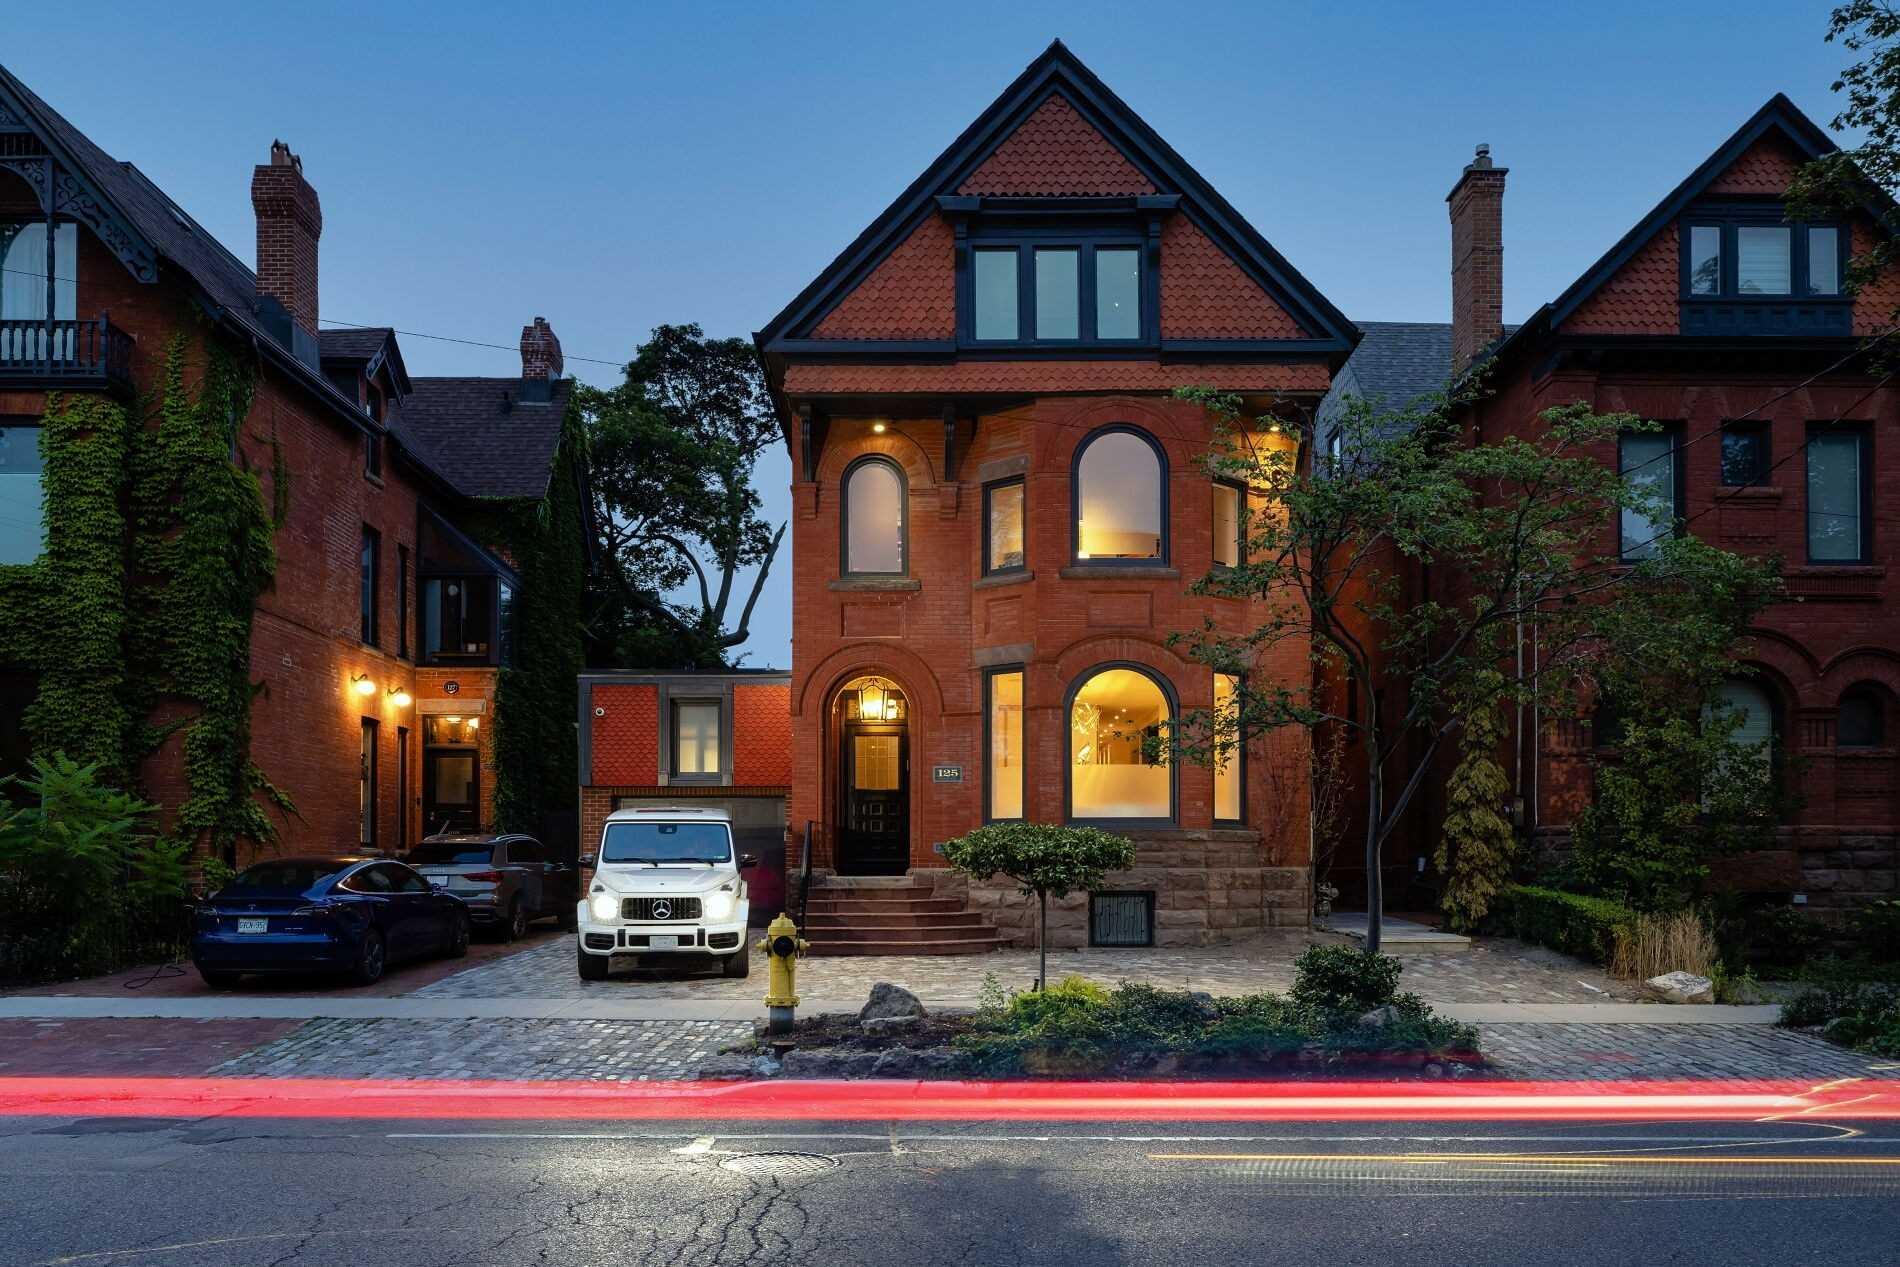 125 Bedford Rd, Toronto, Ontario M5R2K6, 4 Bedrooms Bedrooms, 9 Rooms Rooms,5 BathroomsBathrooms,Detached,For Sale,Bedford,C5377035